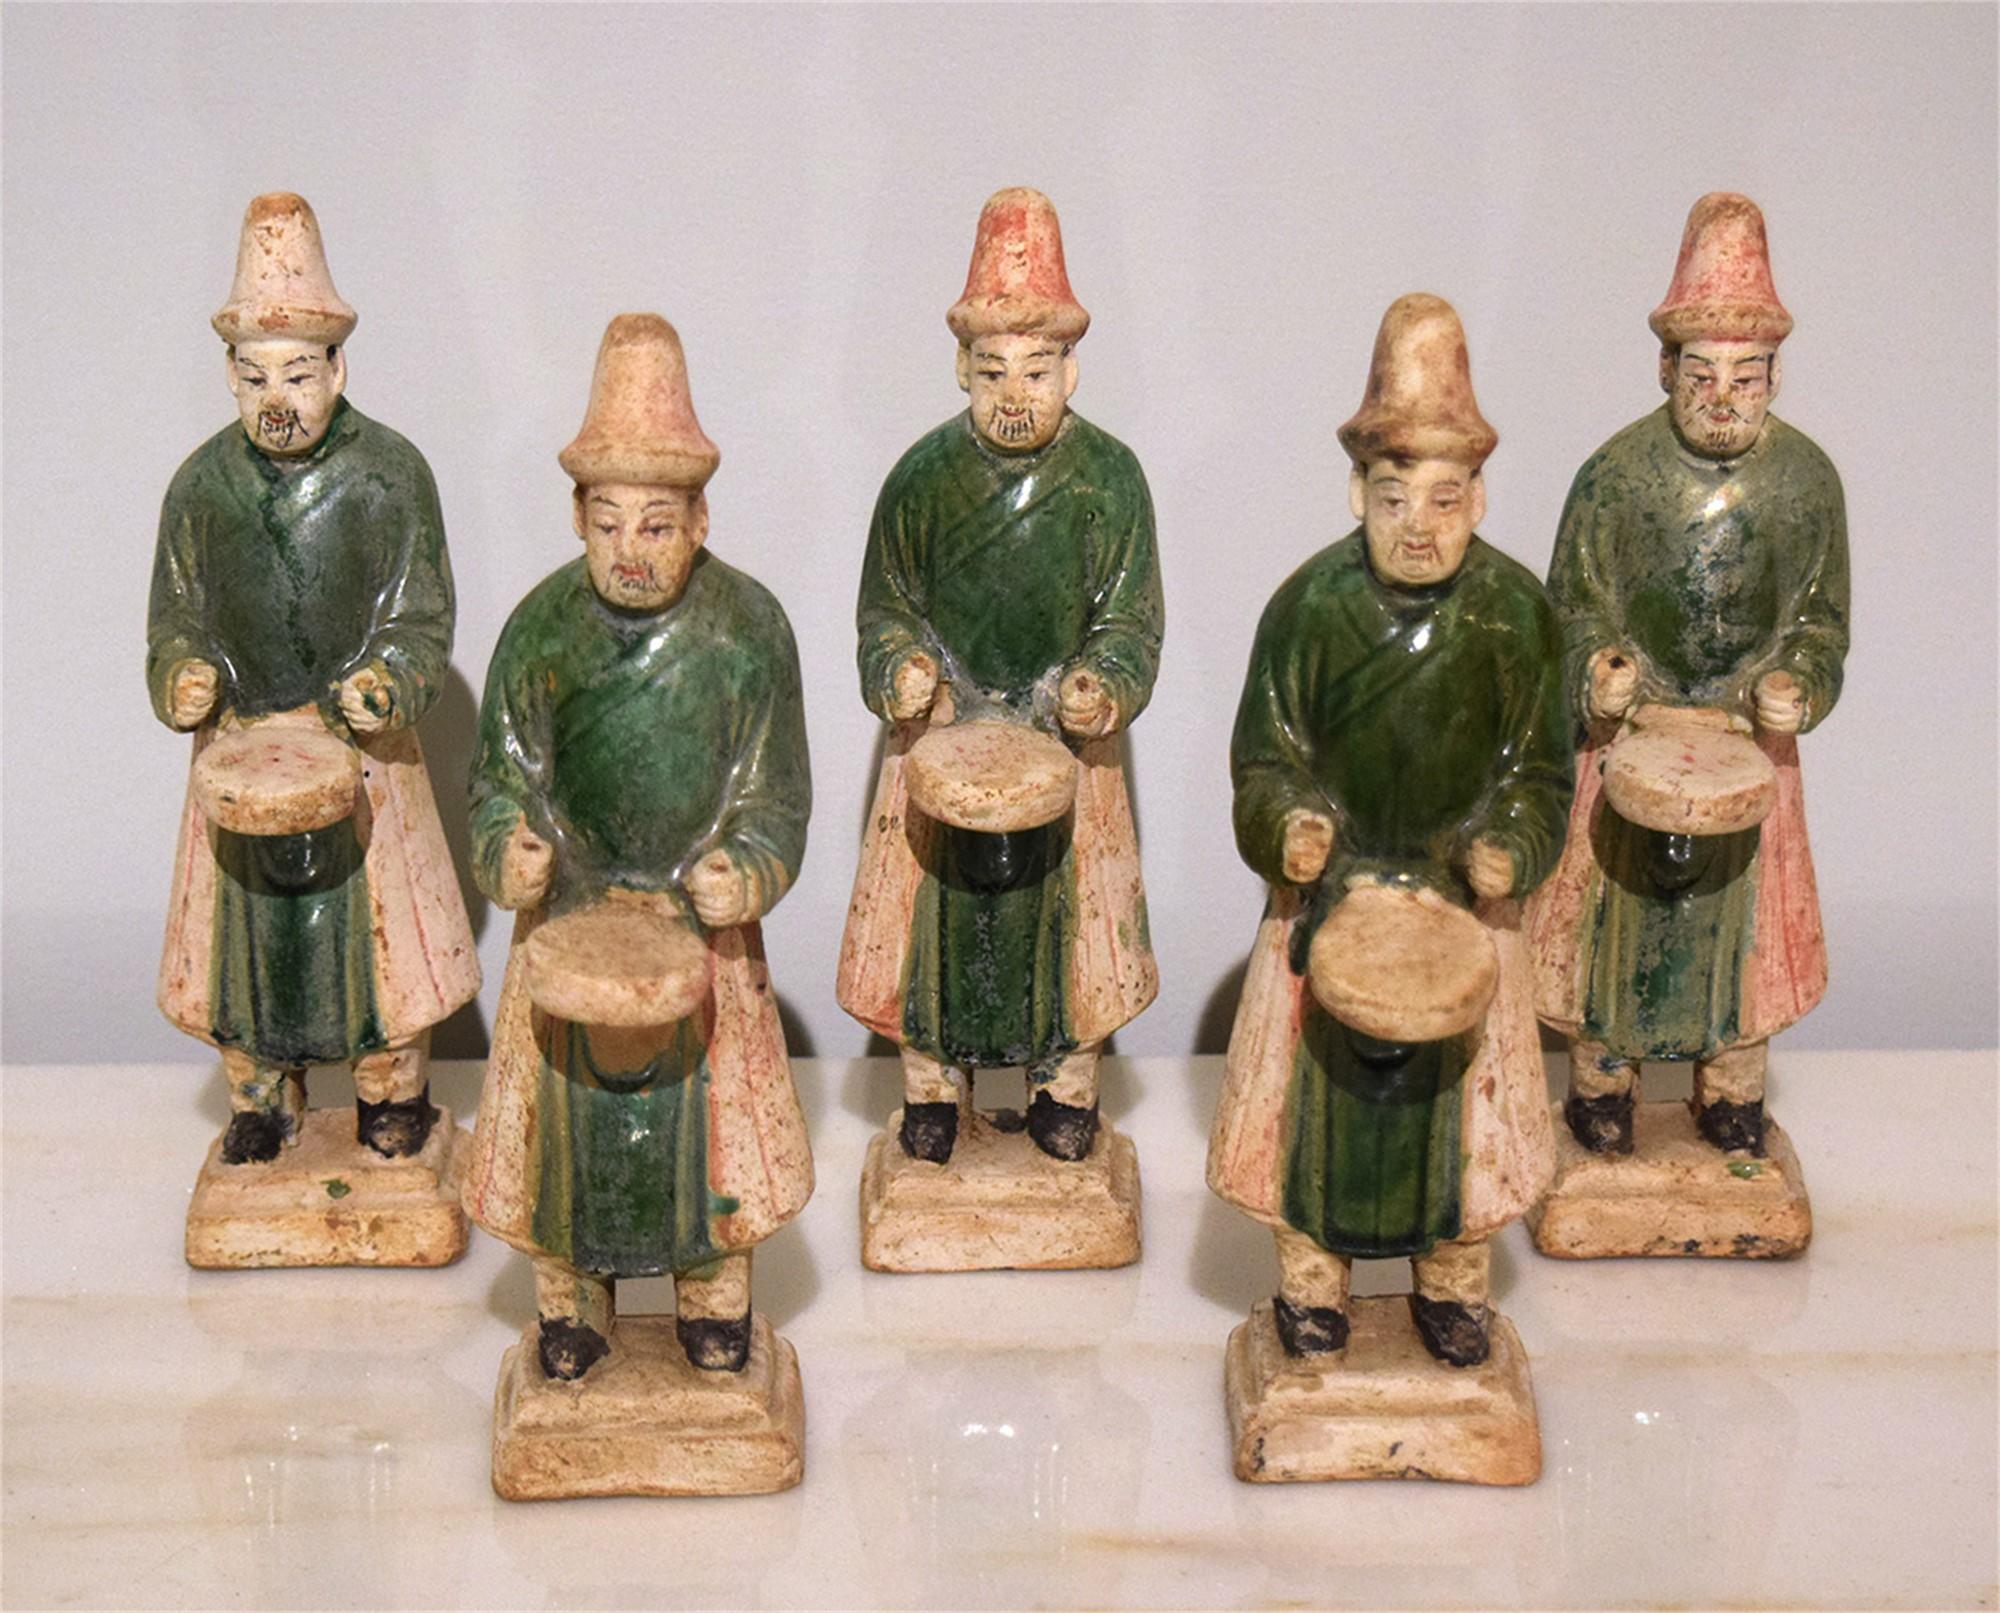 SET OF 5 GREEN-GLAZED DRUMMERS